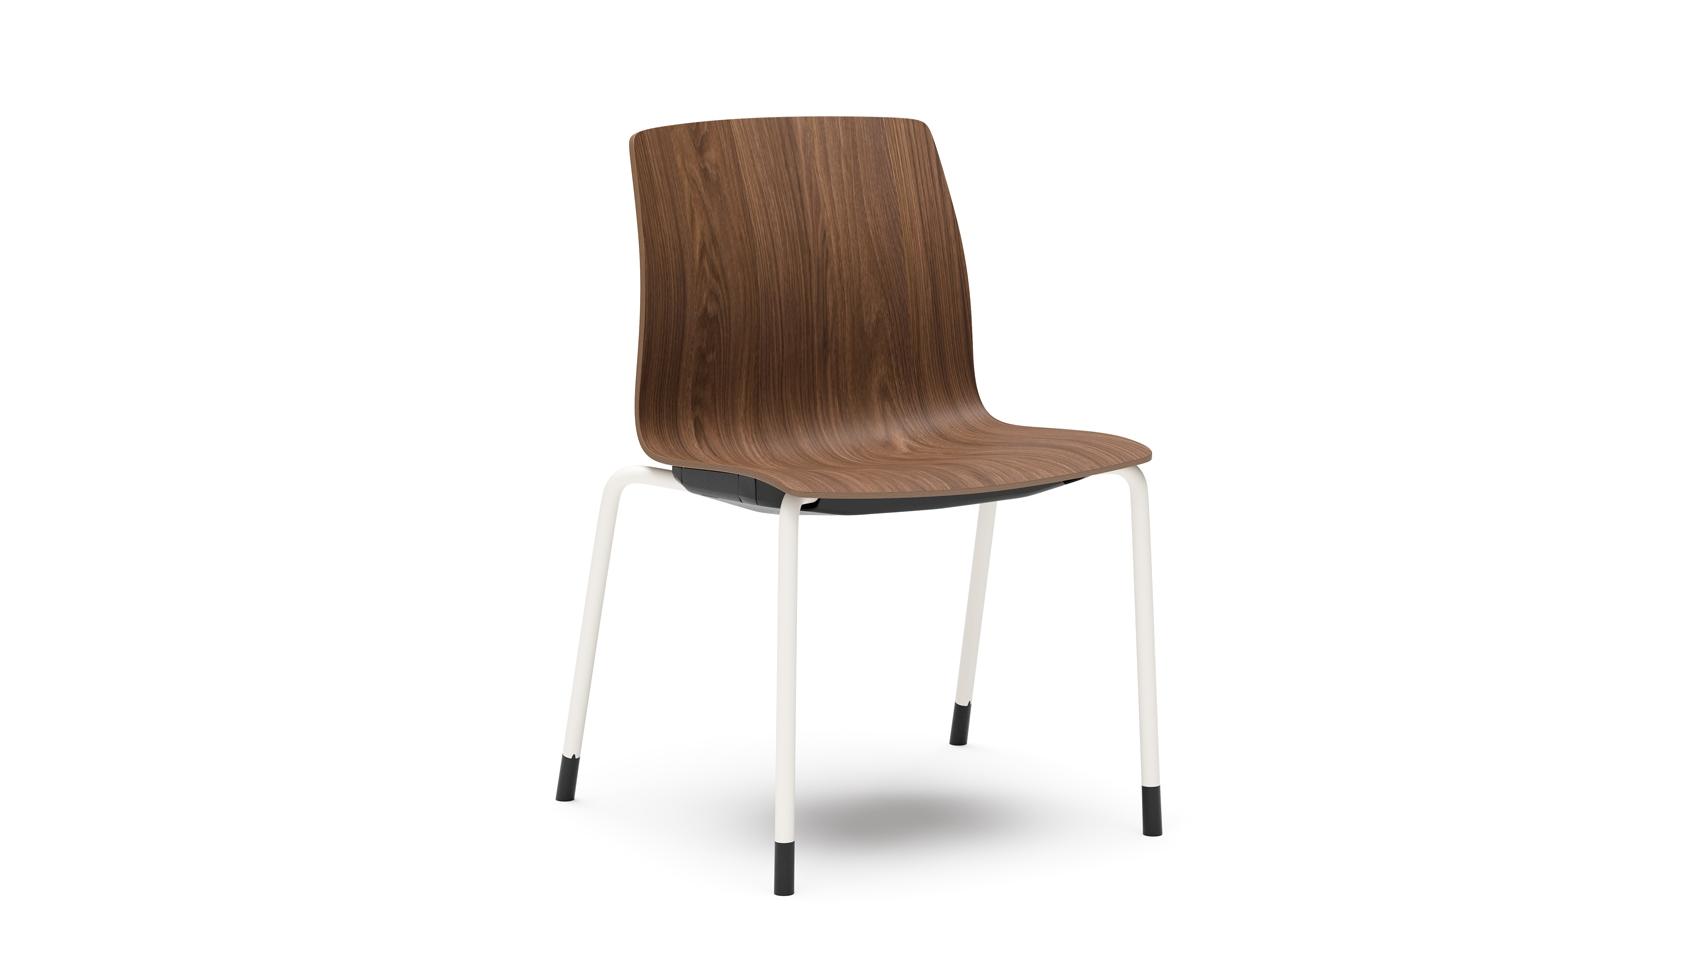 Seating: OFS Harpin